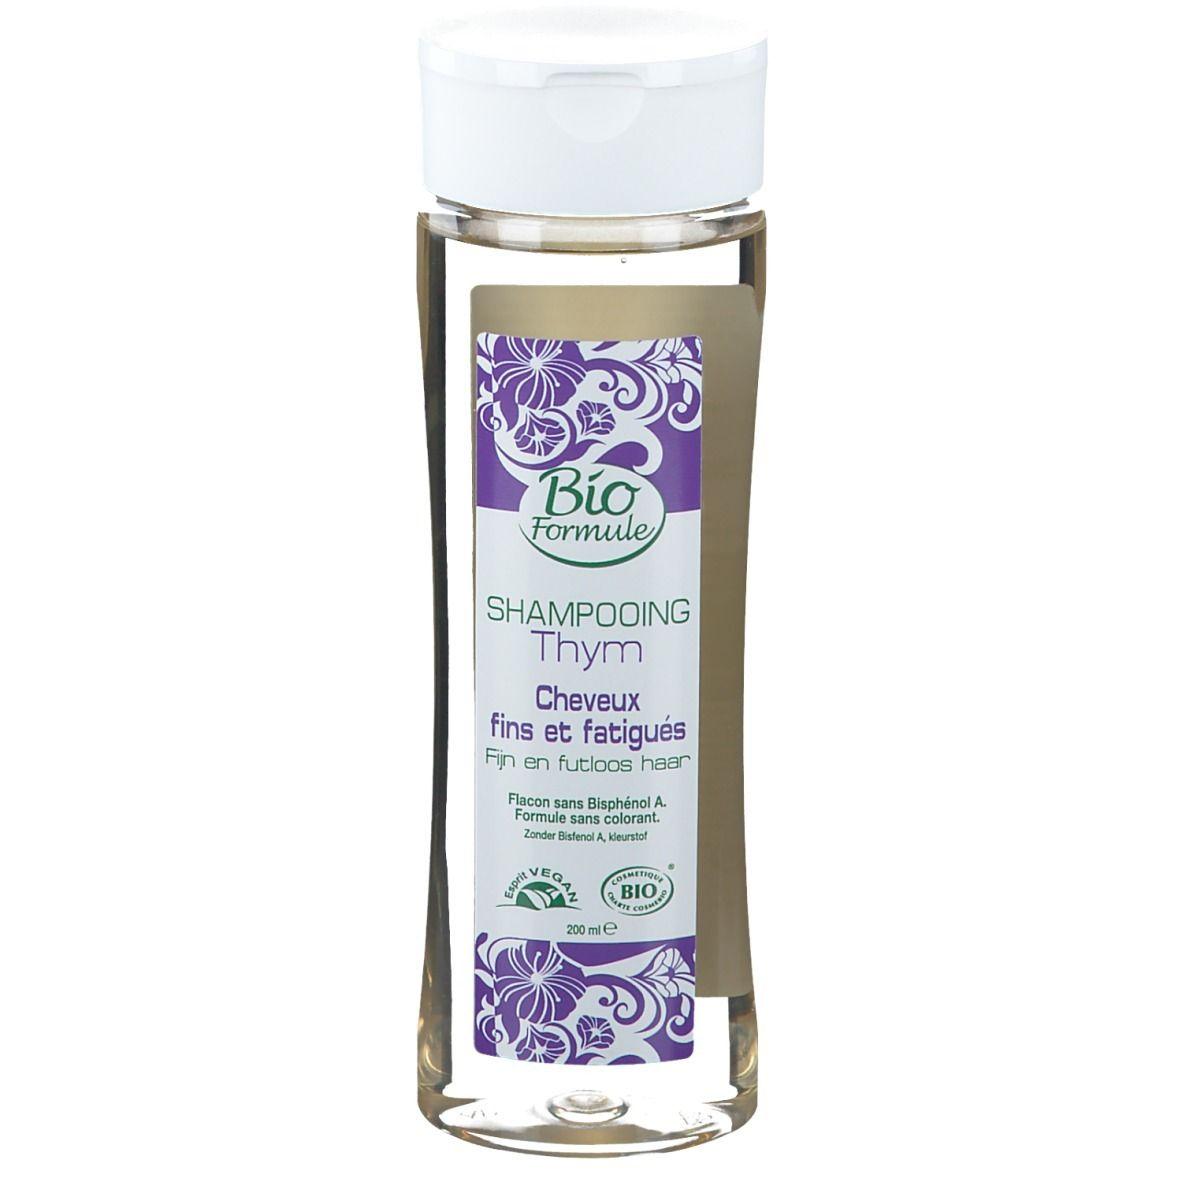 Bio Formule Shampooing Thym ml shampooing